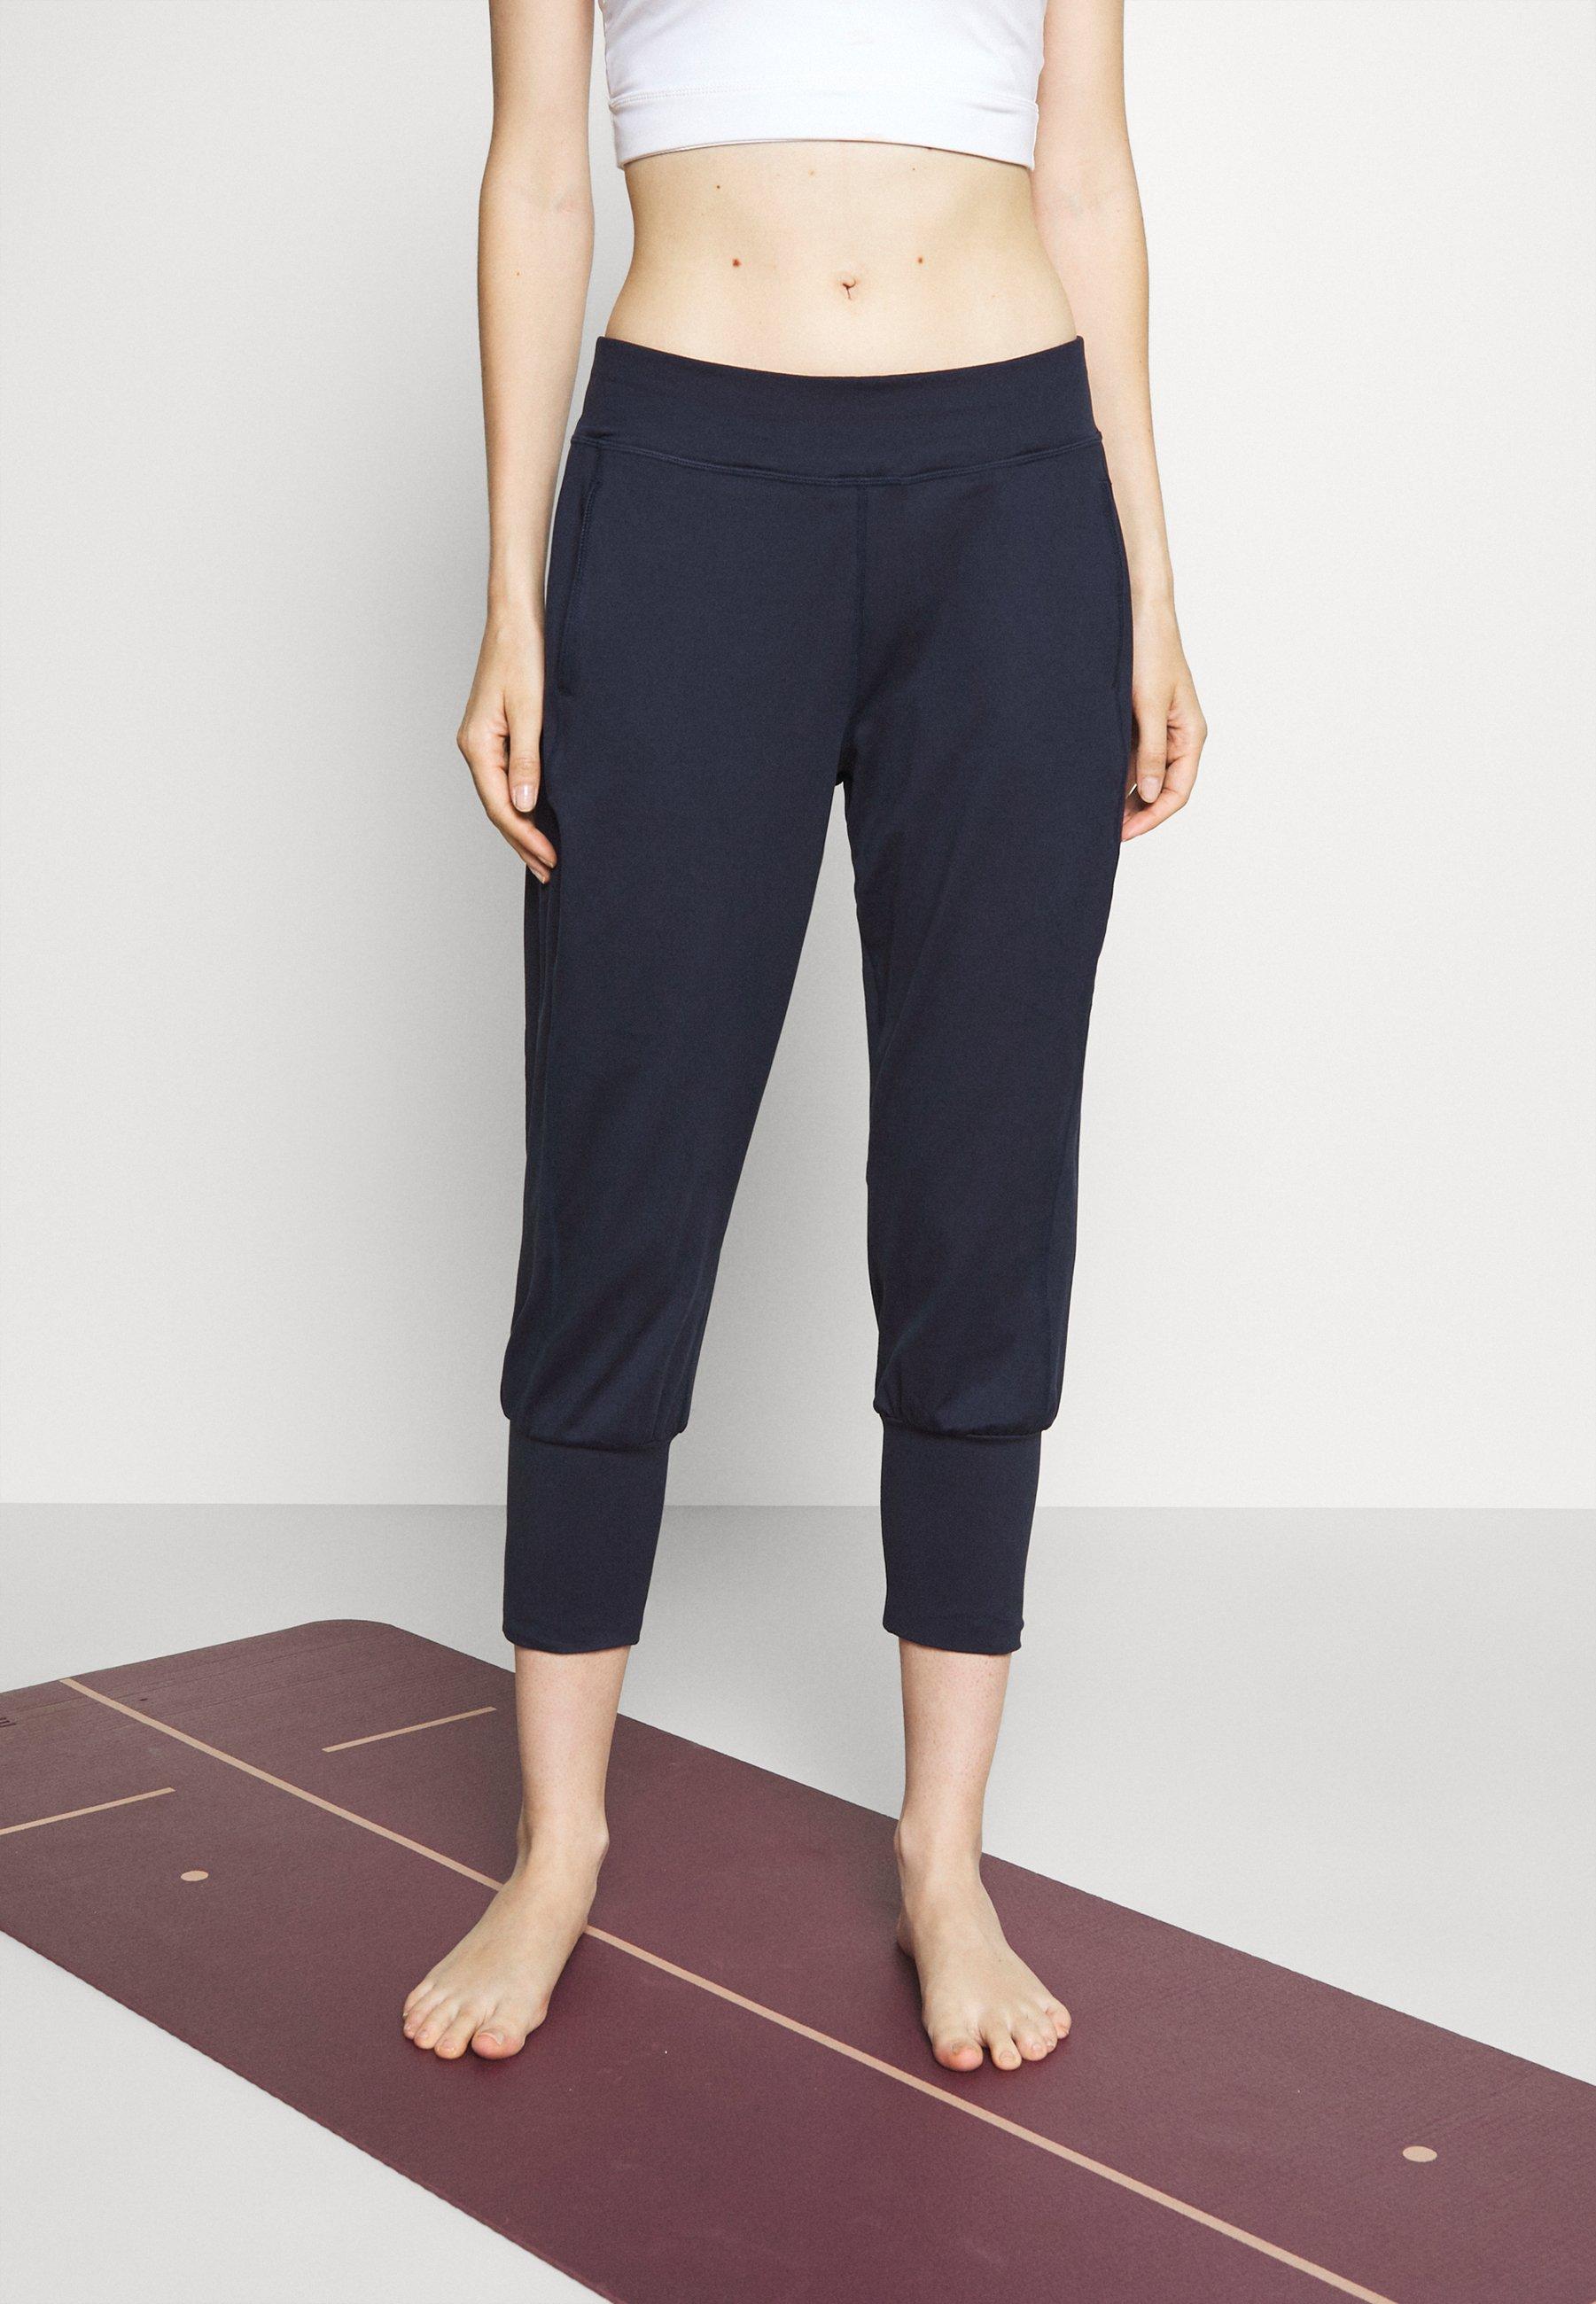 Donna GARY YOGA CAPRIS - Pantaloni sportivi